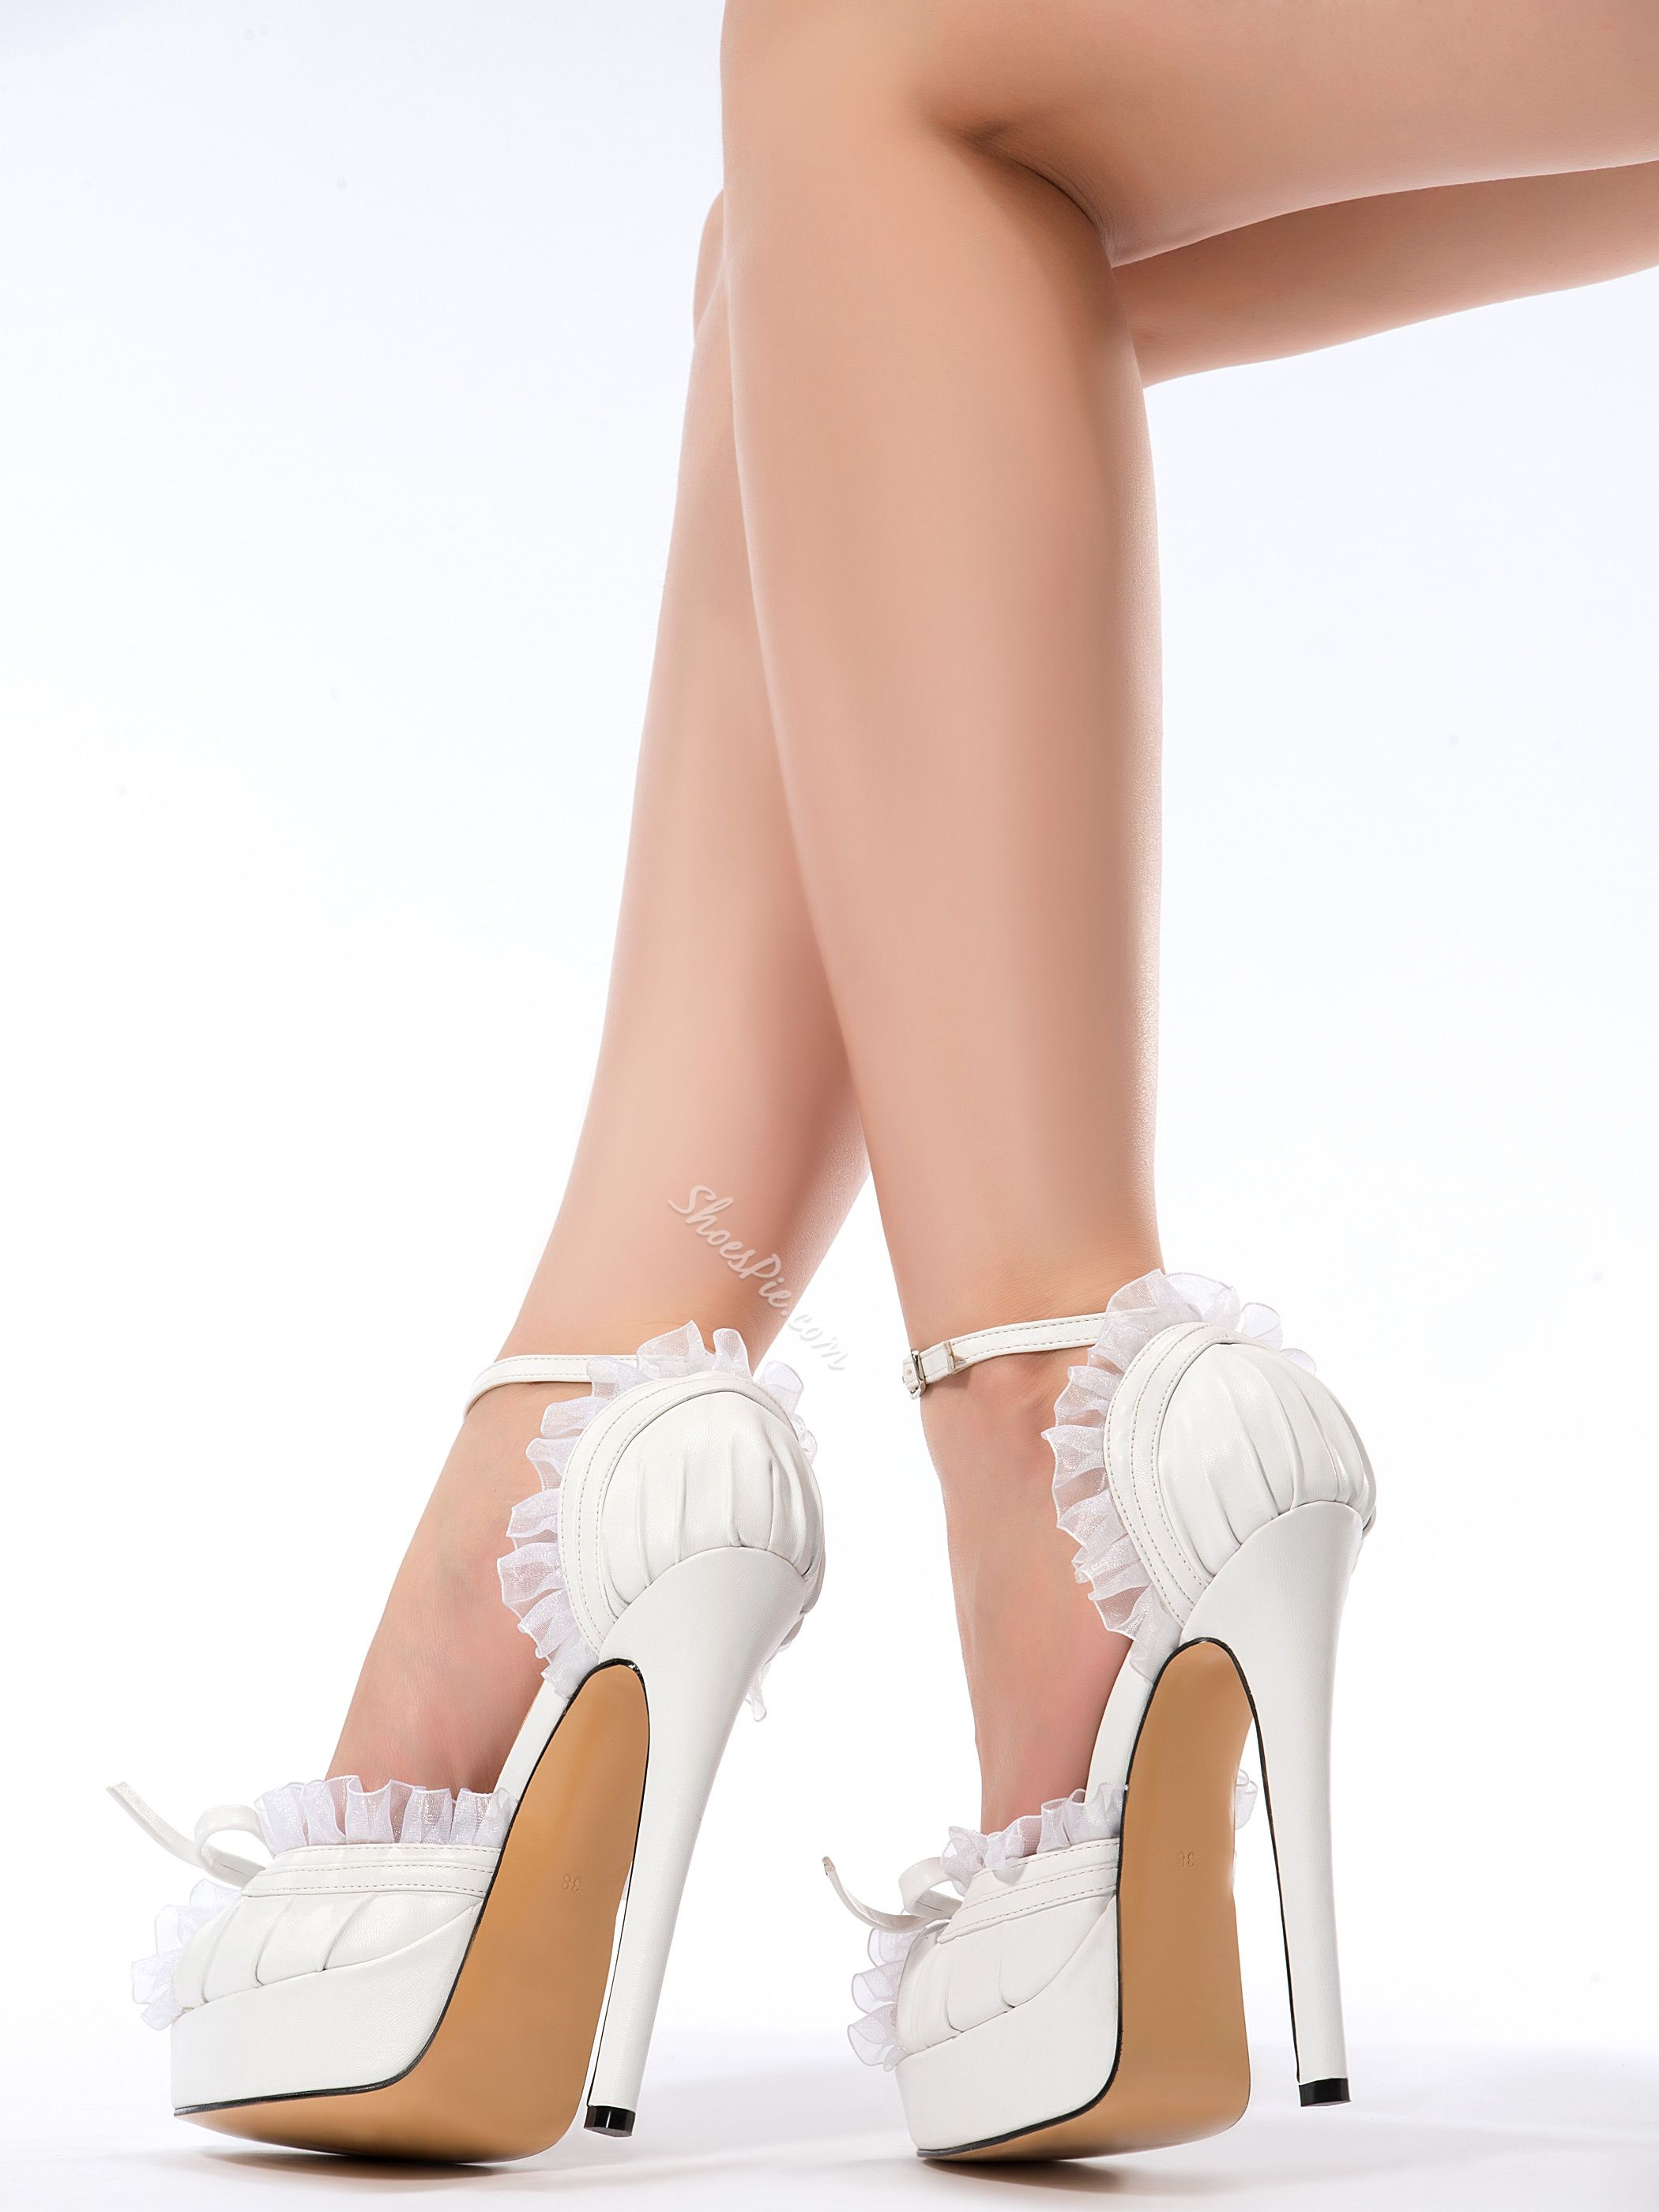 4472254f006 Elegant White PU Peep Toe Ankle Strap High Heel Shoes